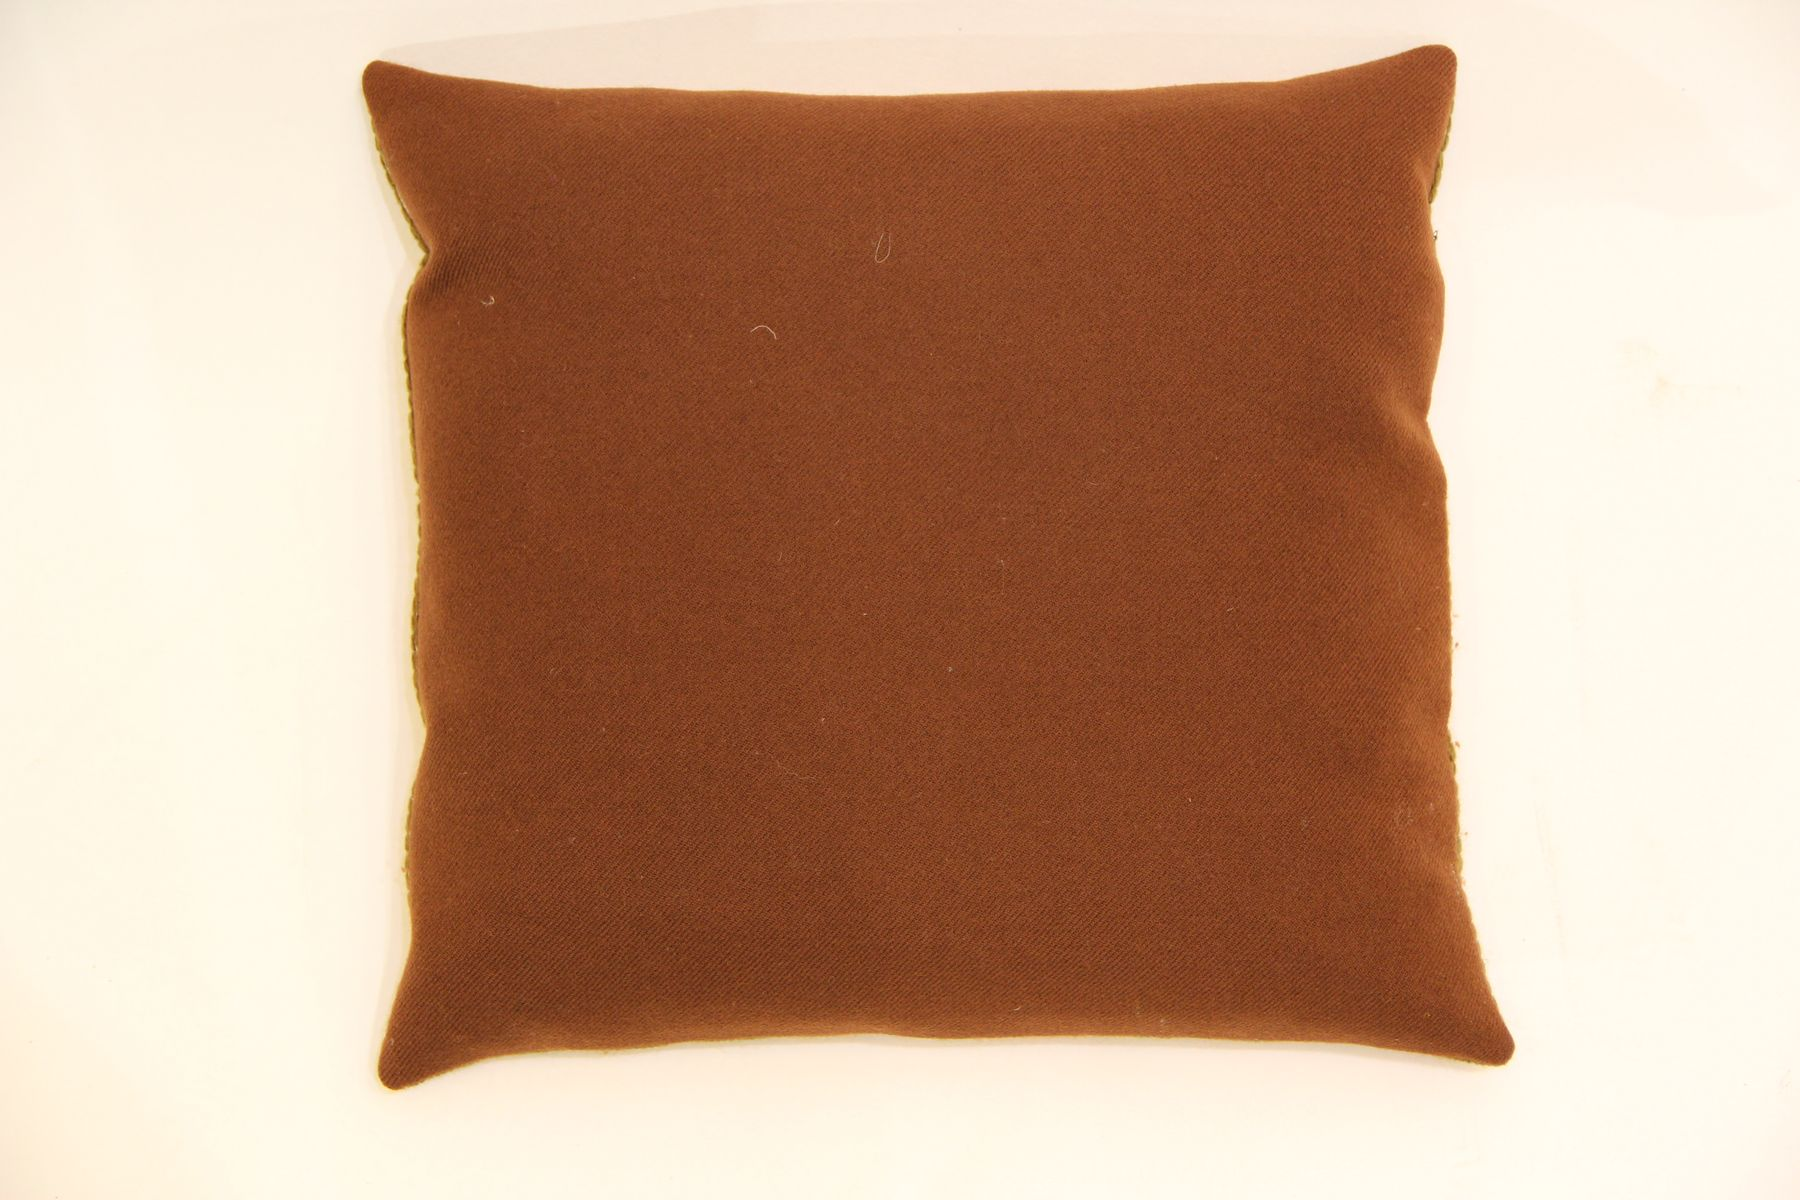 Vintage Danish Hand Embroidered Sofa Cushion for sale at Pamono